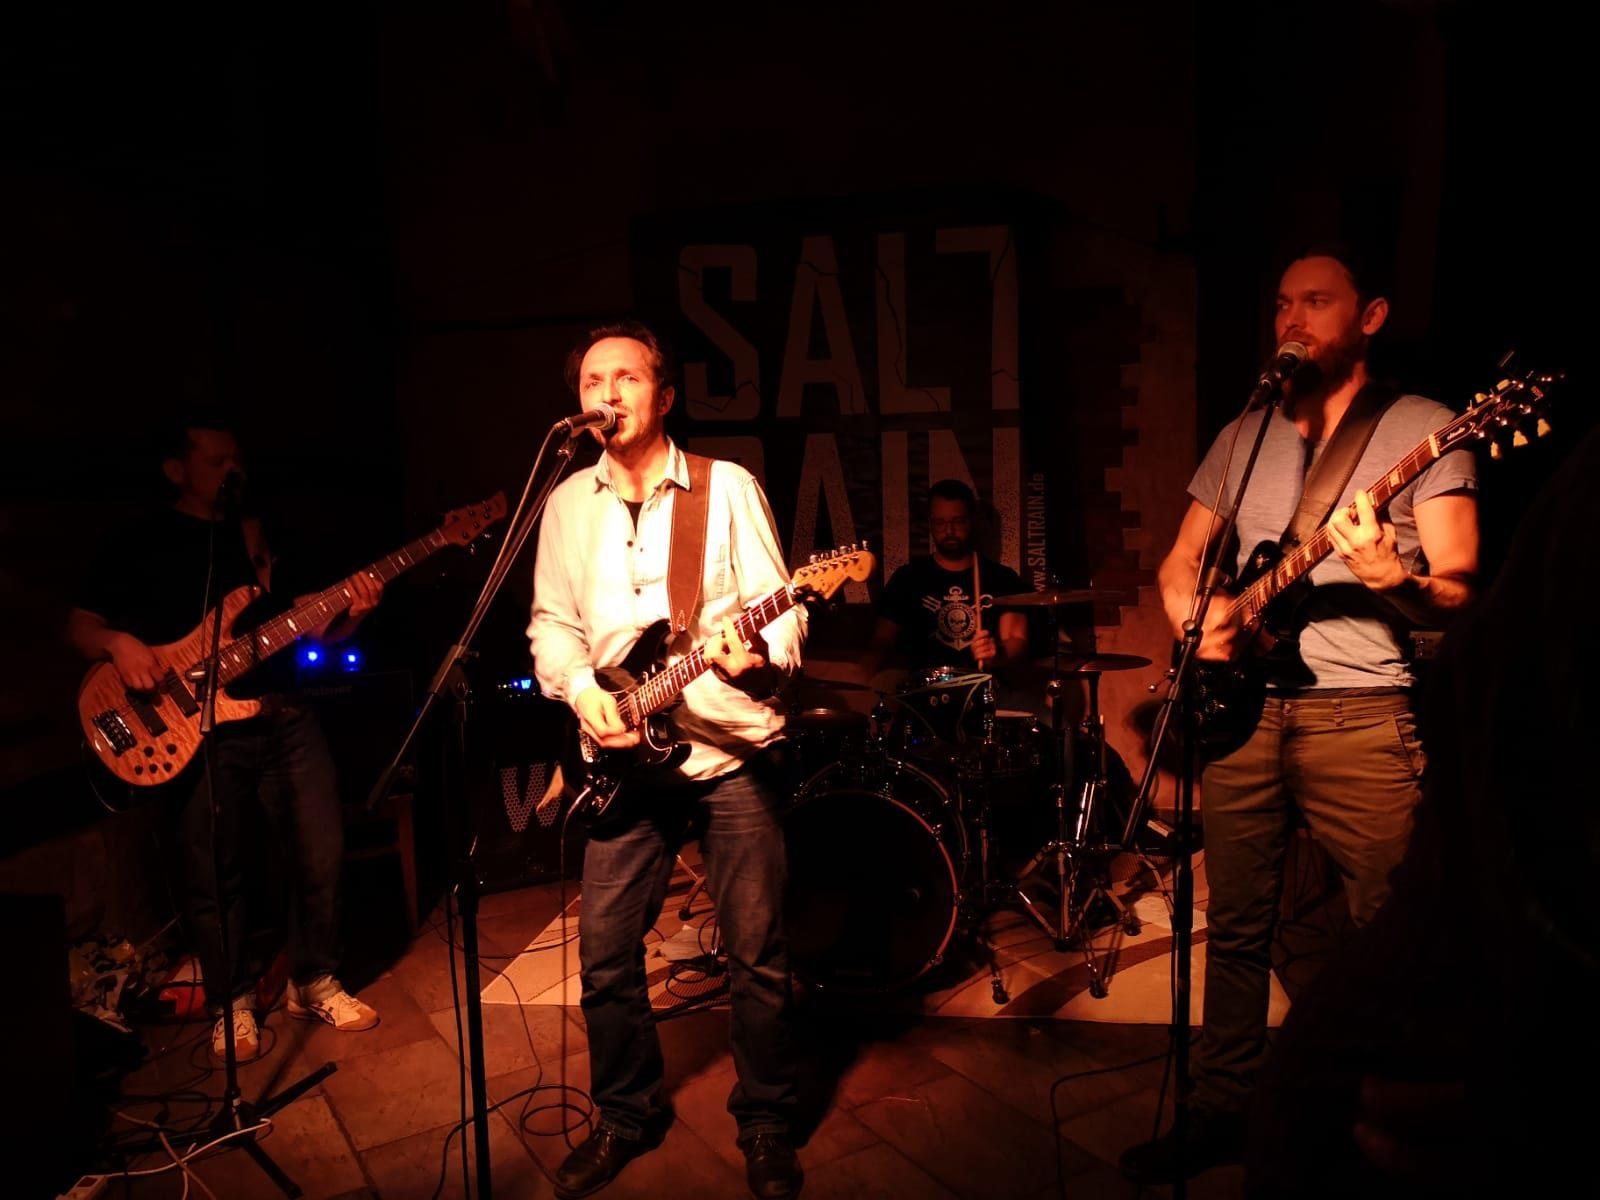 Salt Rain live - Eik's Corner 2020 Osterwieck